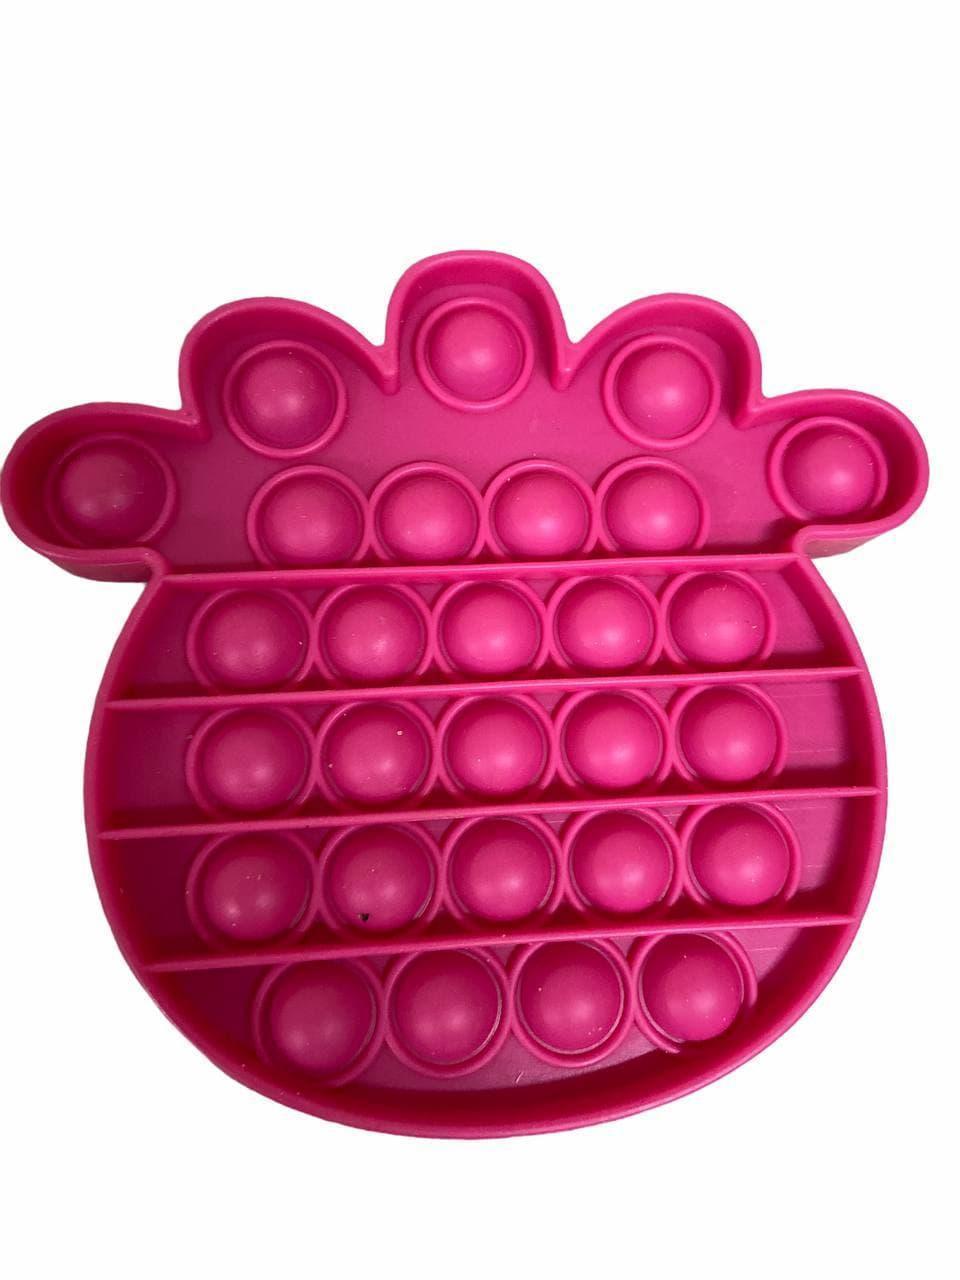 Сенсорна іграшка Pop It антистрес, ананас вишнева Push Bubble Fidget Antistress Нескінченна Пупырка